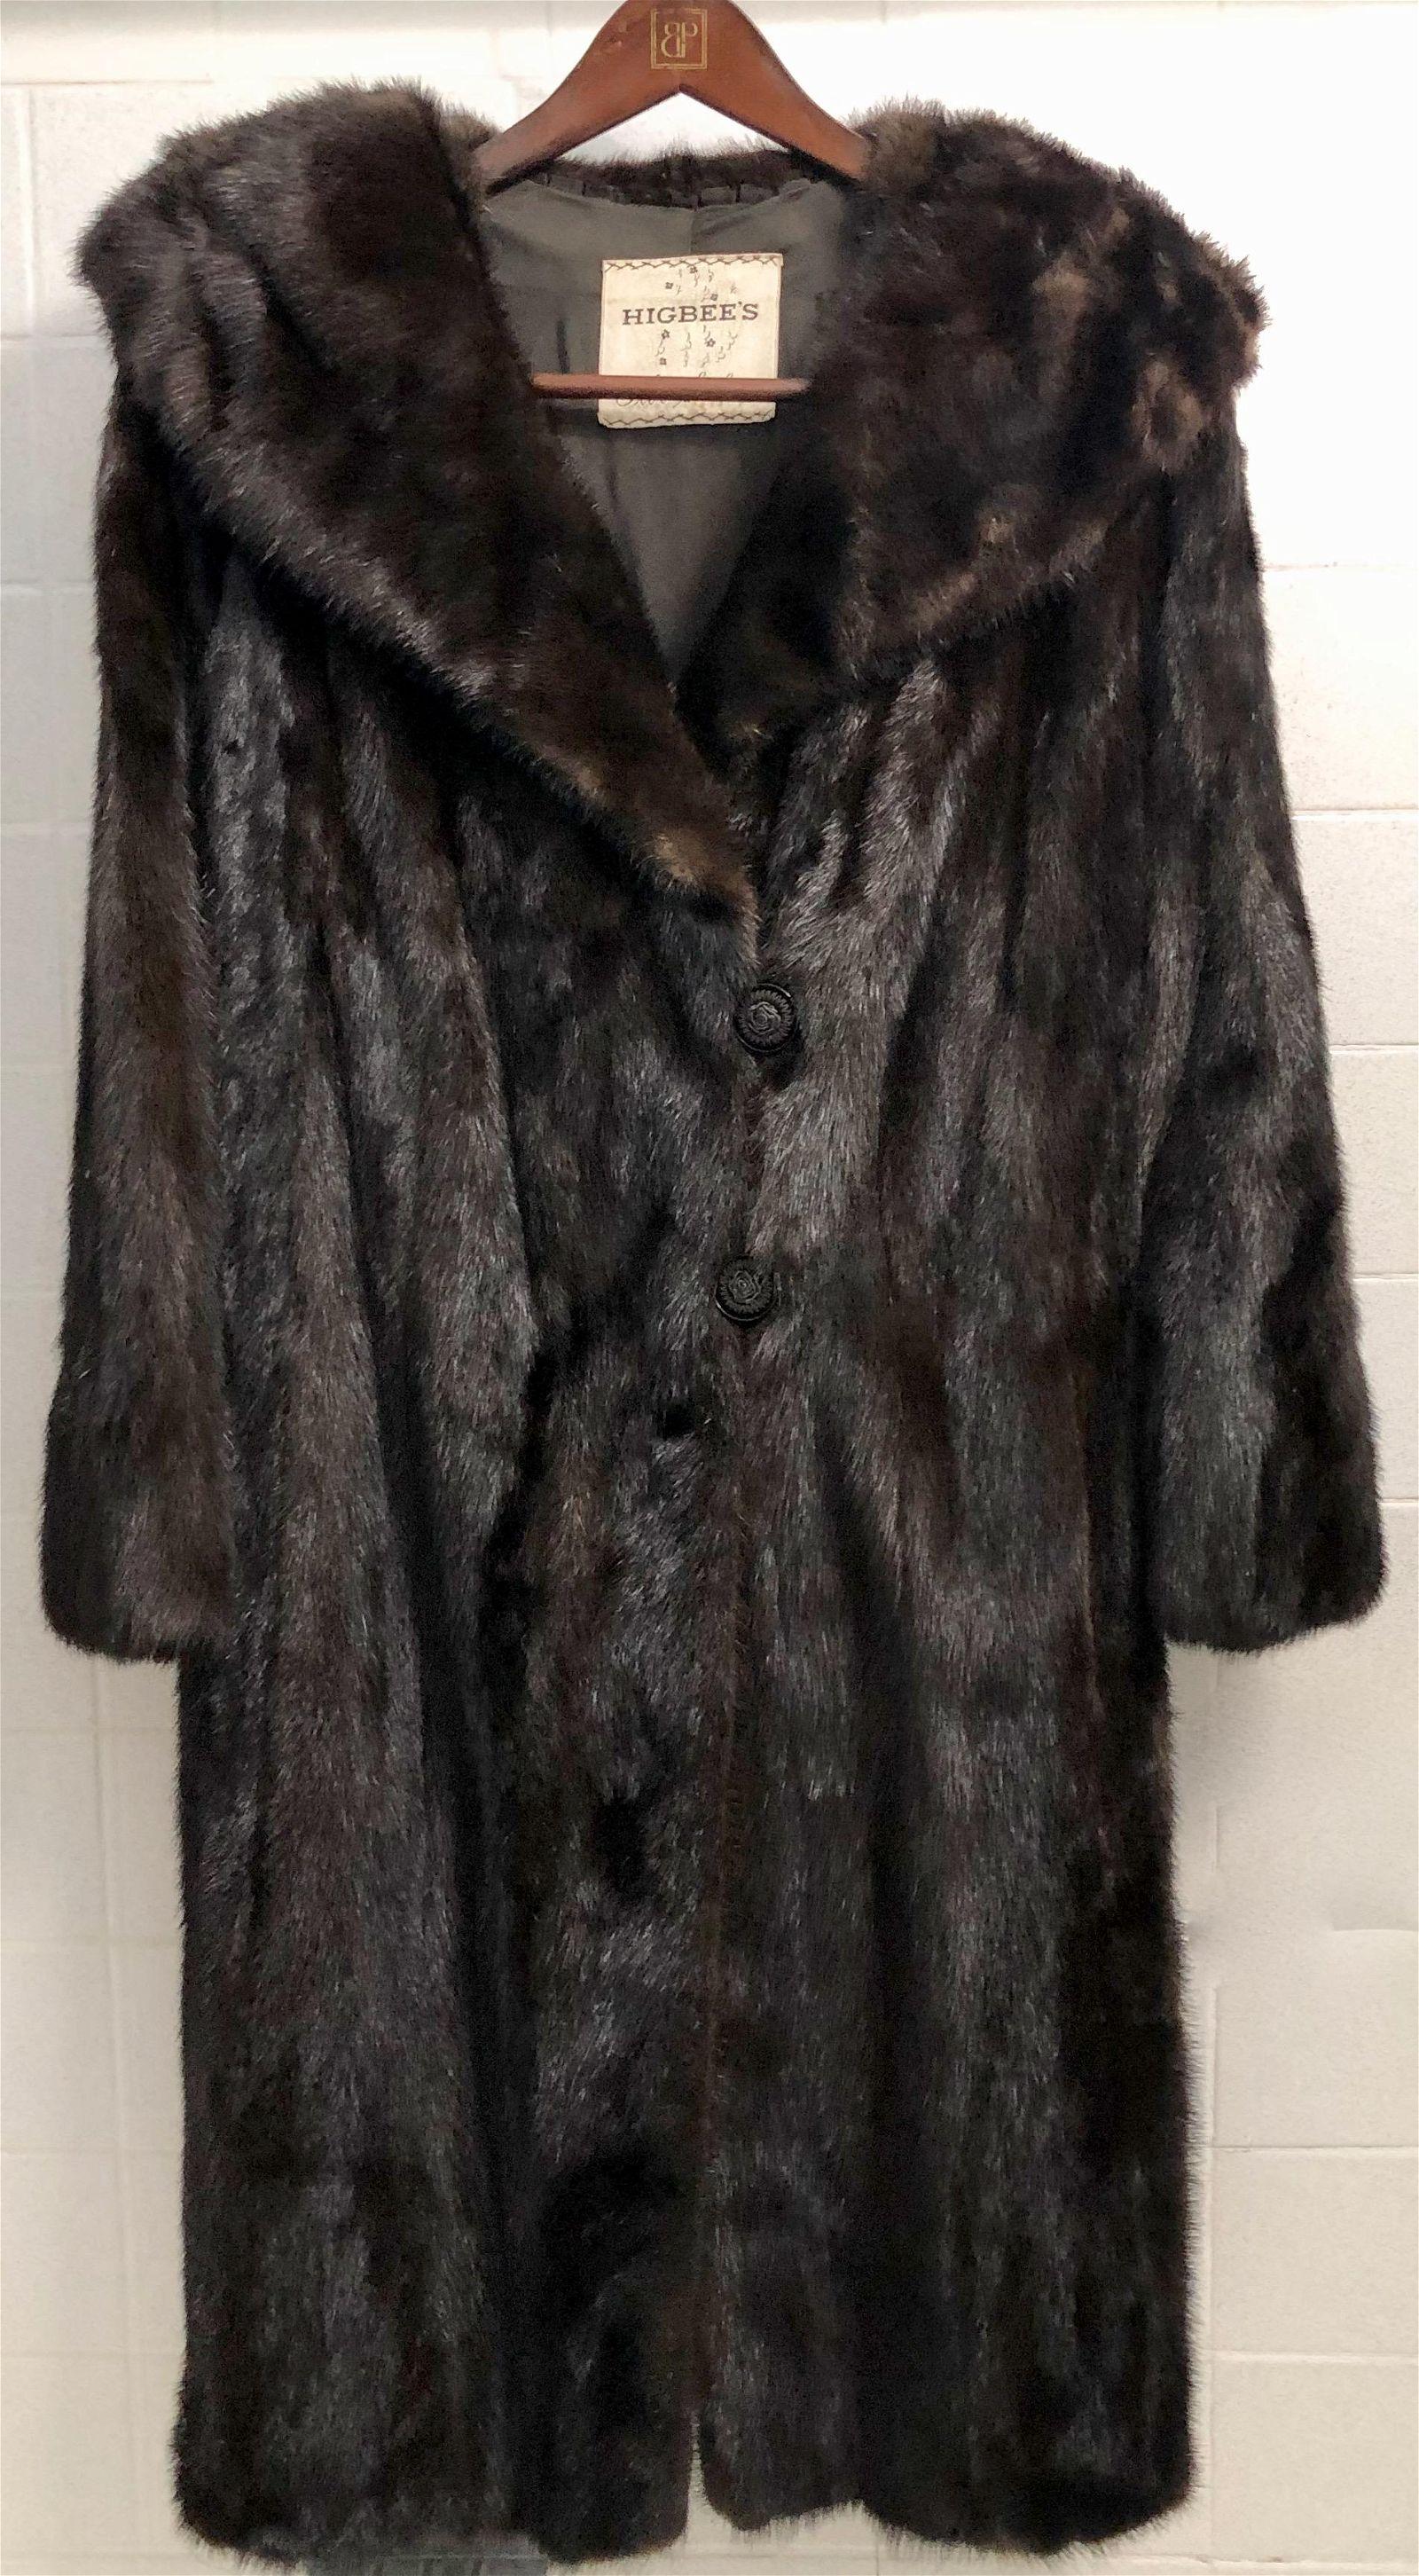 Vintage Black Mink High Shawl Collar Fur Coat